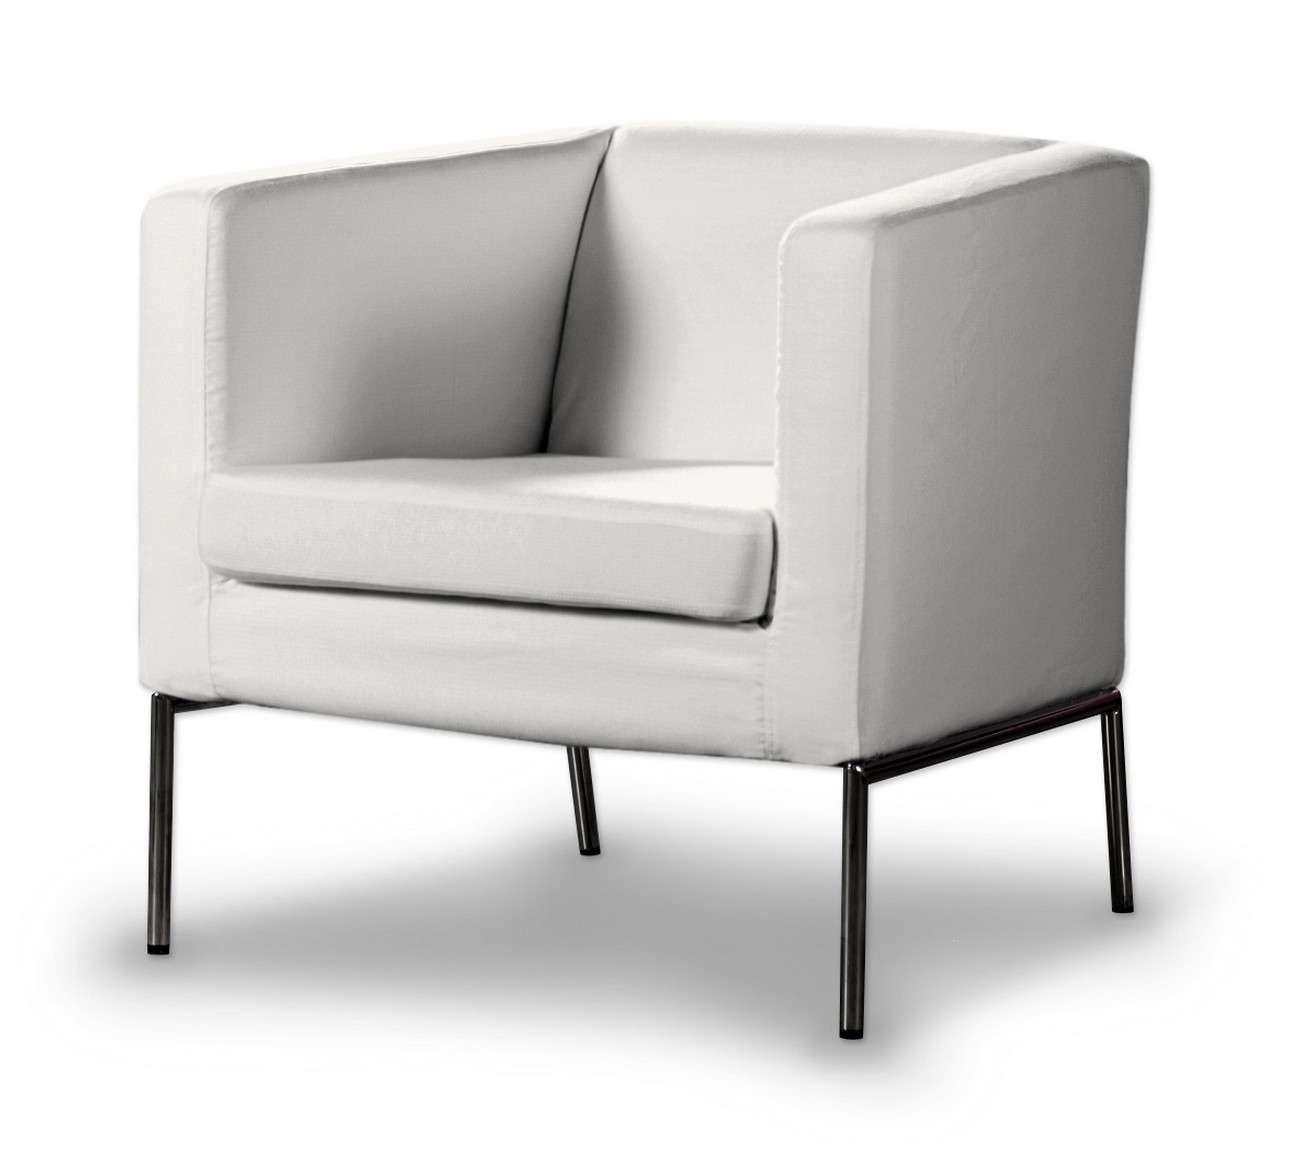 Klappsta betræk lænestol fra kollektionen Cotton Panama, Stof: 702-34